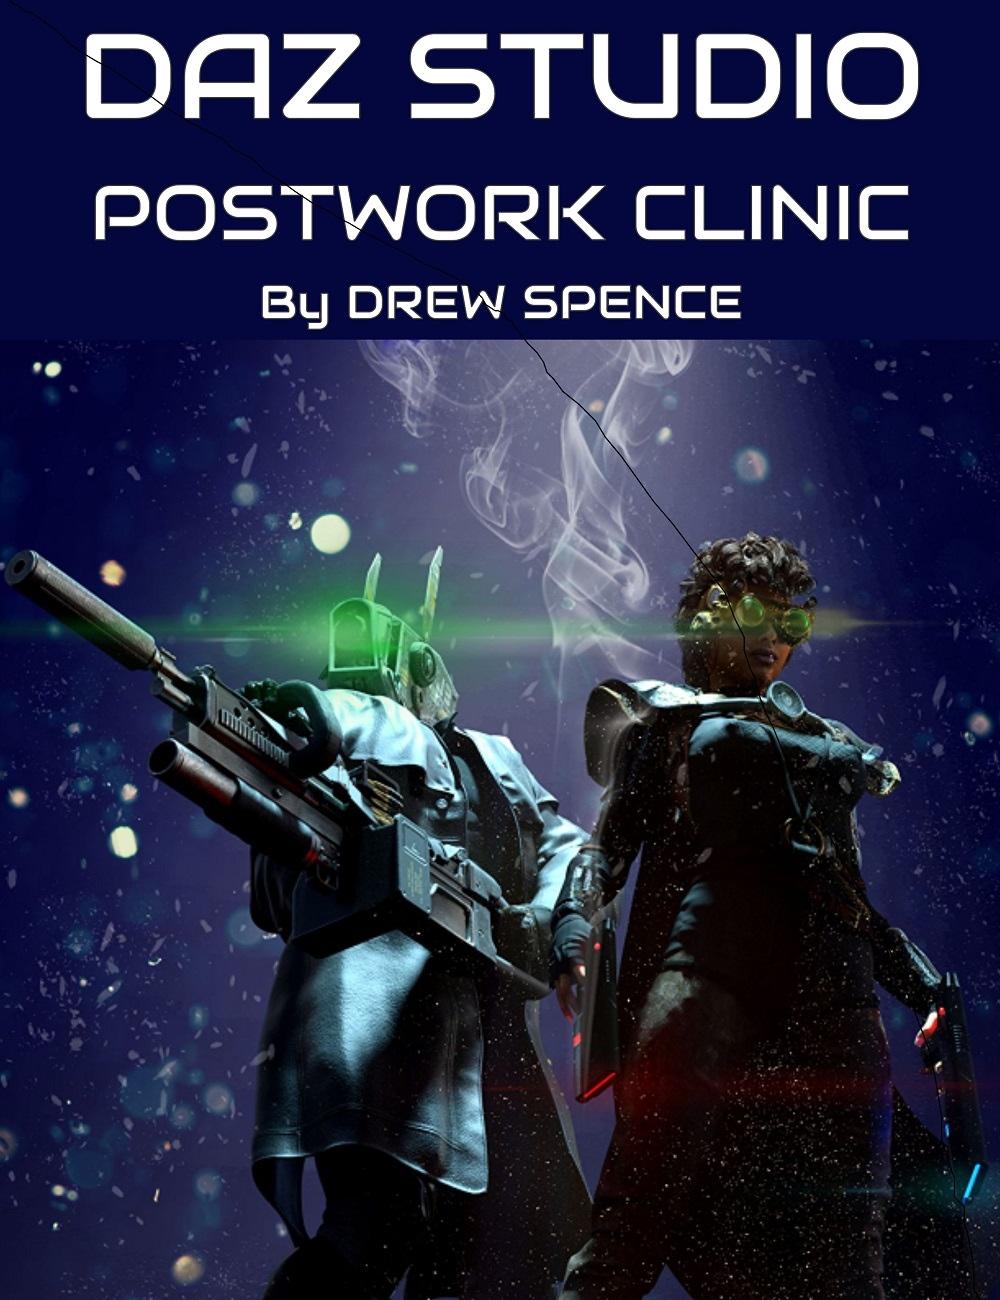 Daz Studio Postwork Clinic by: Digital Art Live, 3D Models by Daz 3D